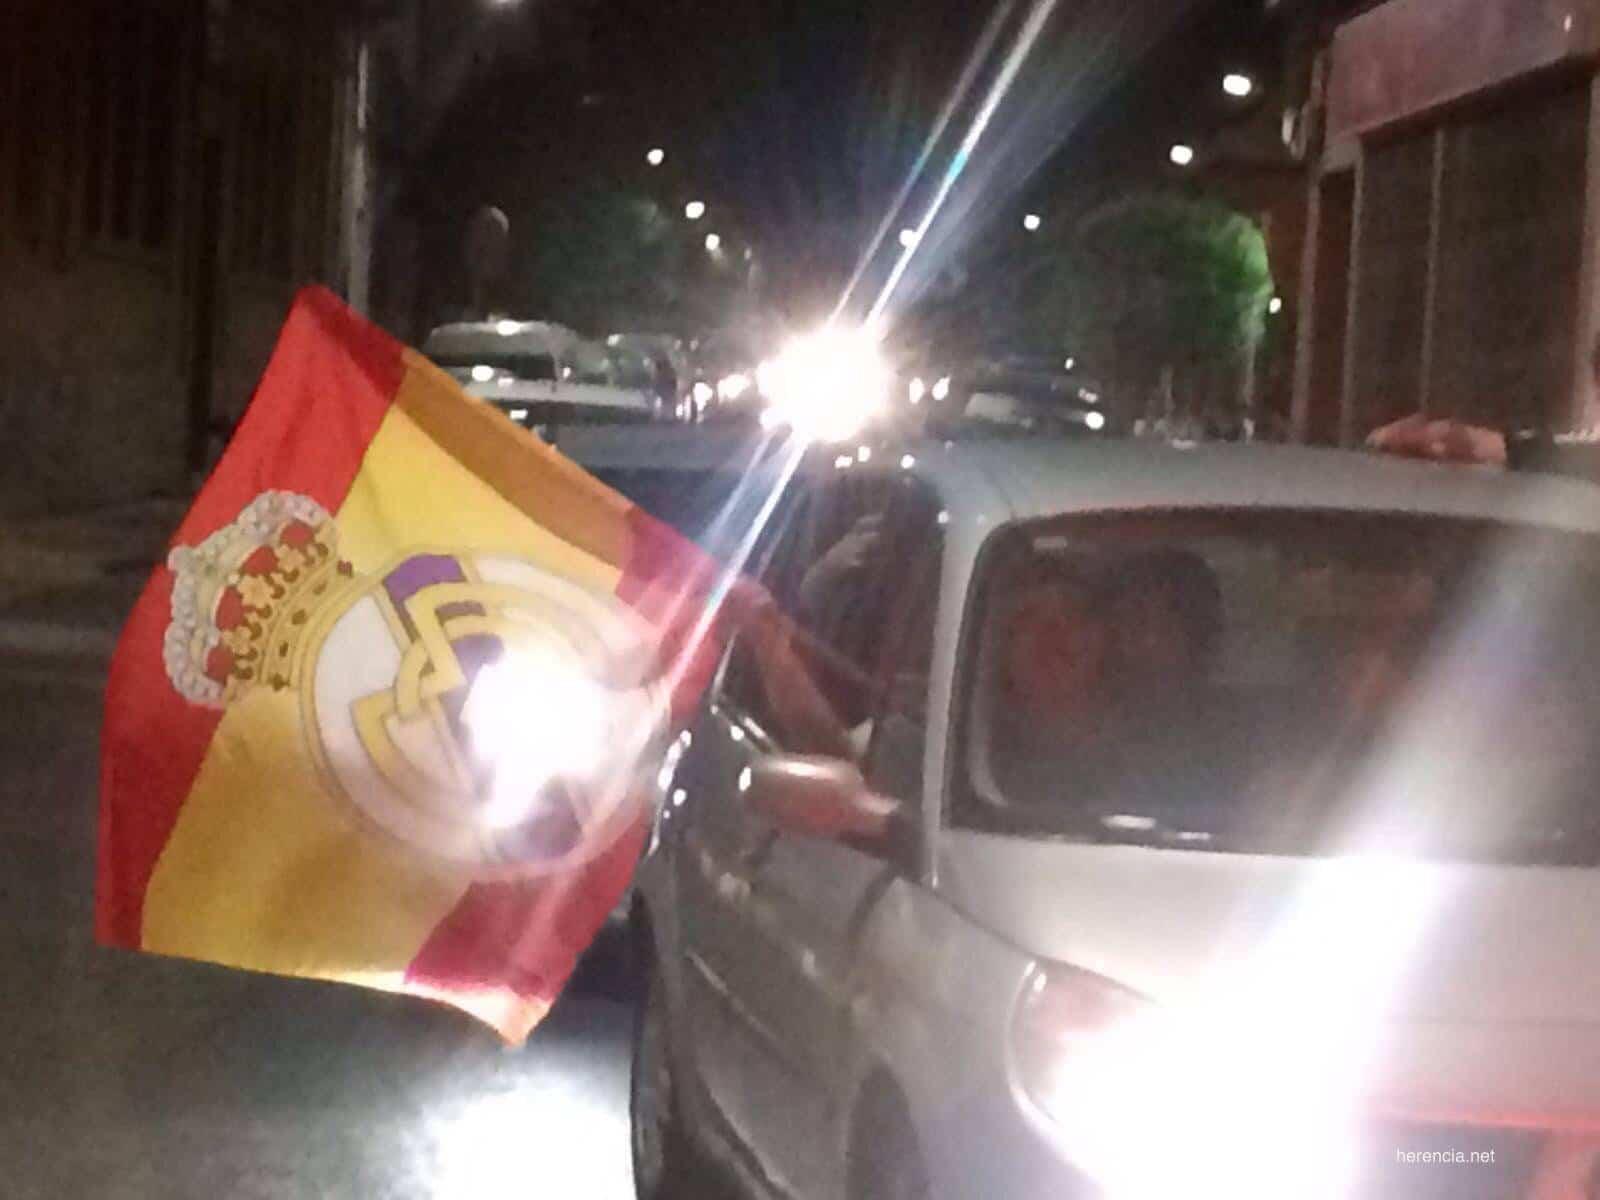 real madrid duodecima copa europa celebracion herencia 3 - Herencia celebra la Duodécima Copa de Europa que gana el Real Madrid